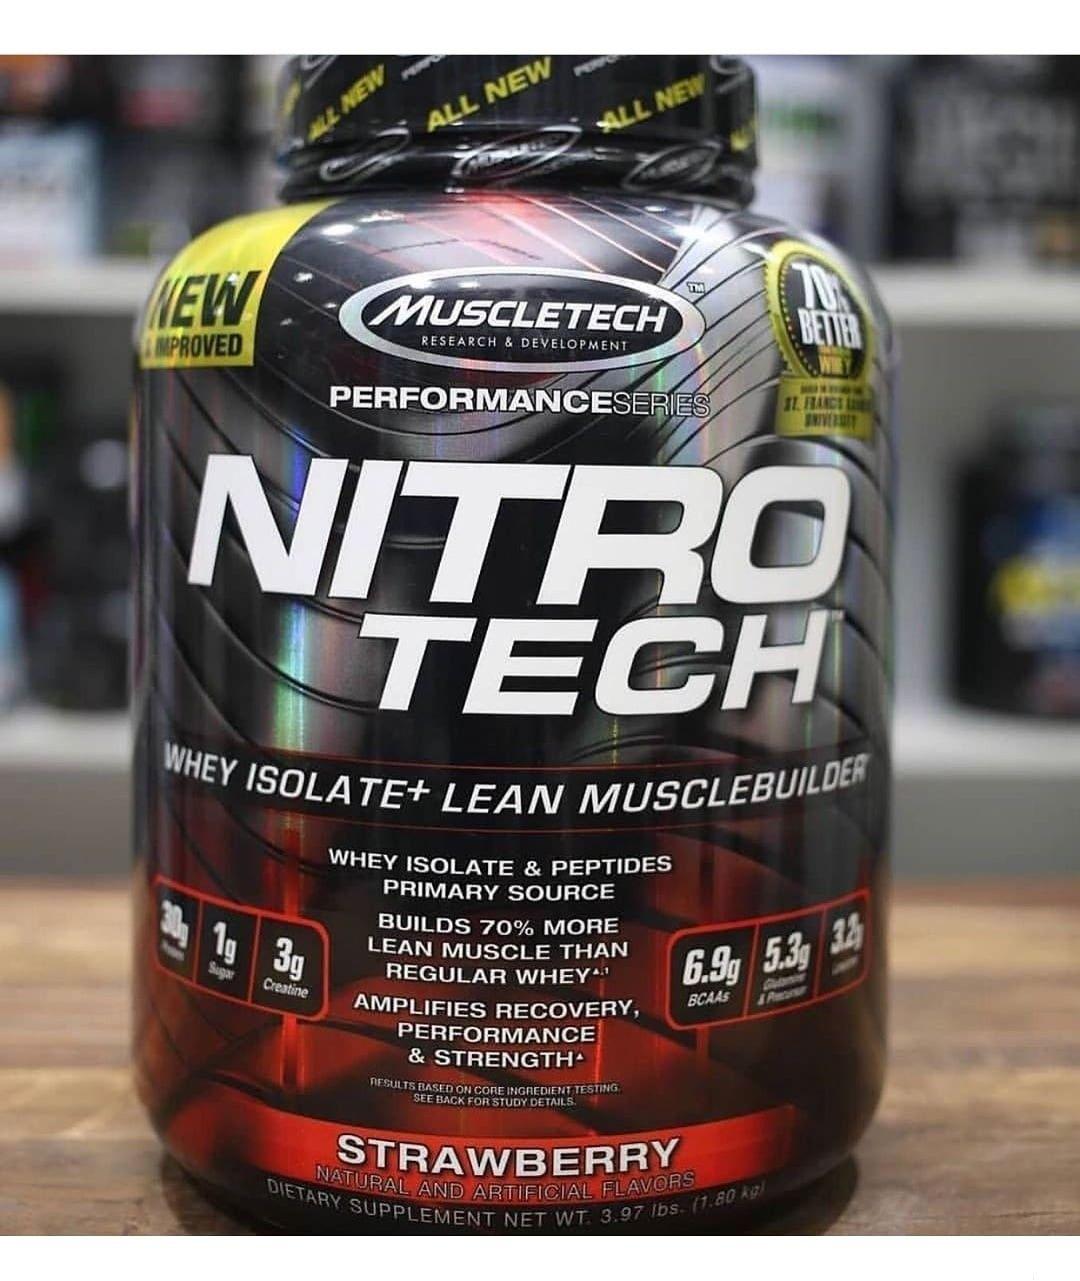 Muscletech Nitro Tech شرش اللبن الذهبي 100 مسحوق بروتين شرش اللبن بمذاق الشيكولاتة المضاعف 5 54 رطل 2 51 كجم Nitro Tech Gold Whey Protein Muscletech